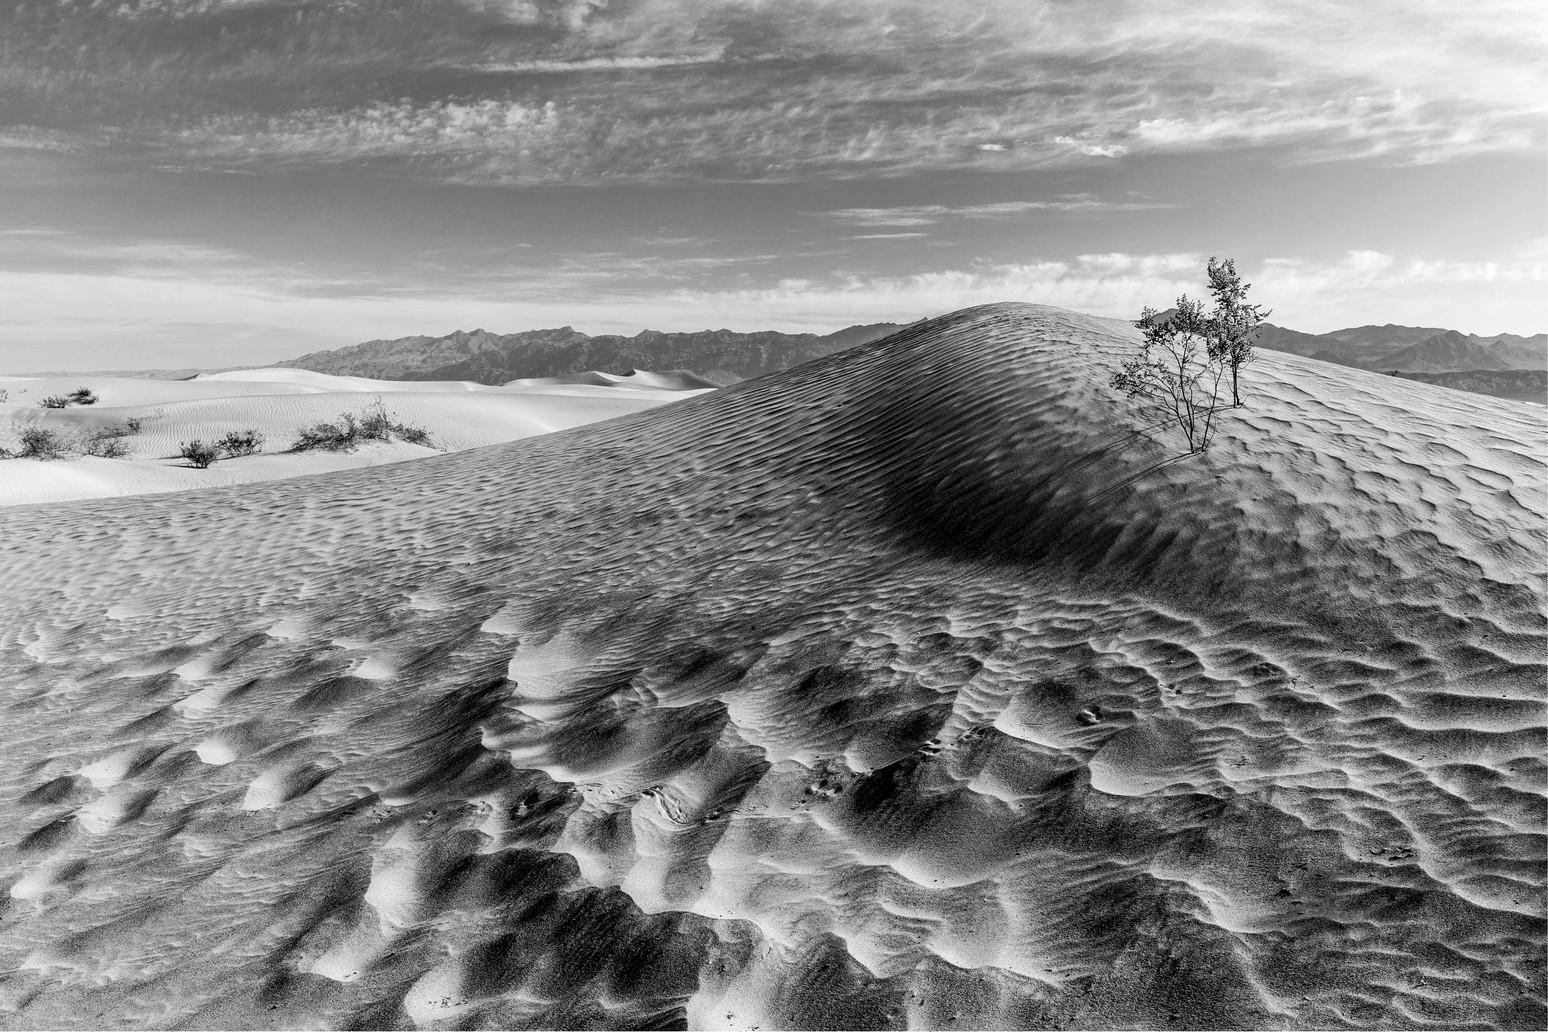 Morning Mesquite Shadows